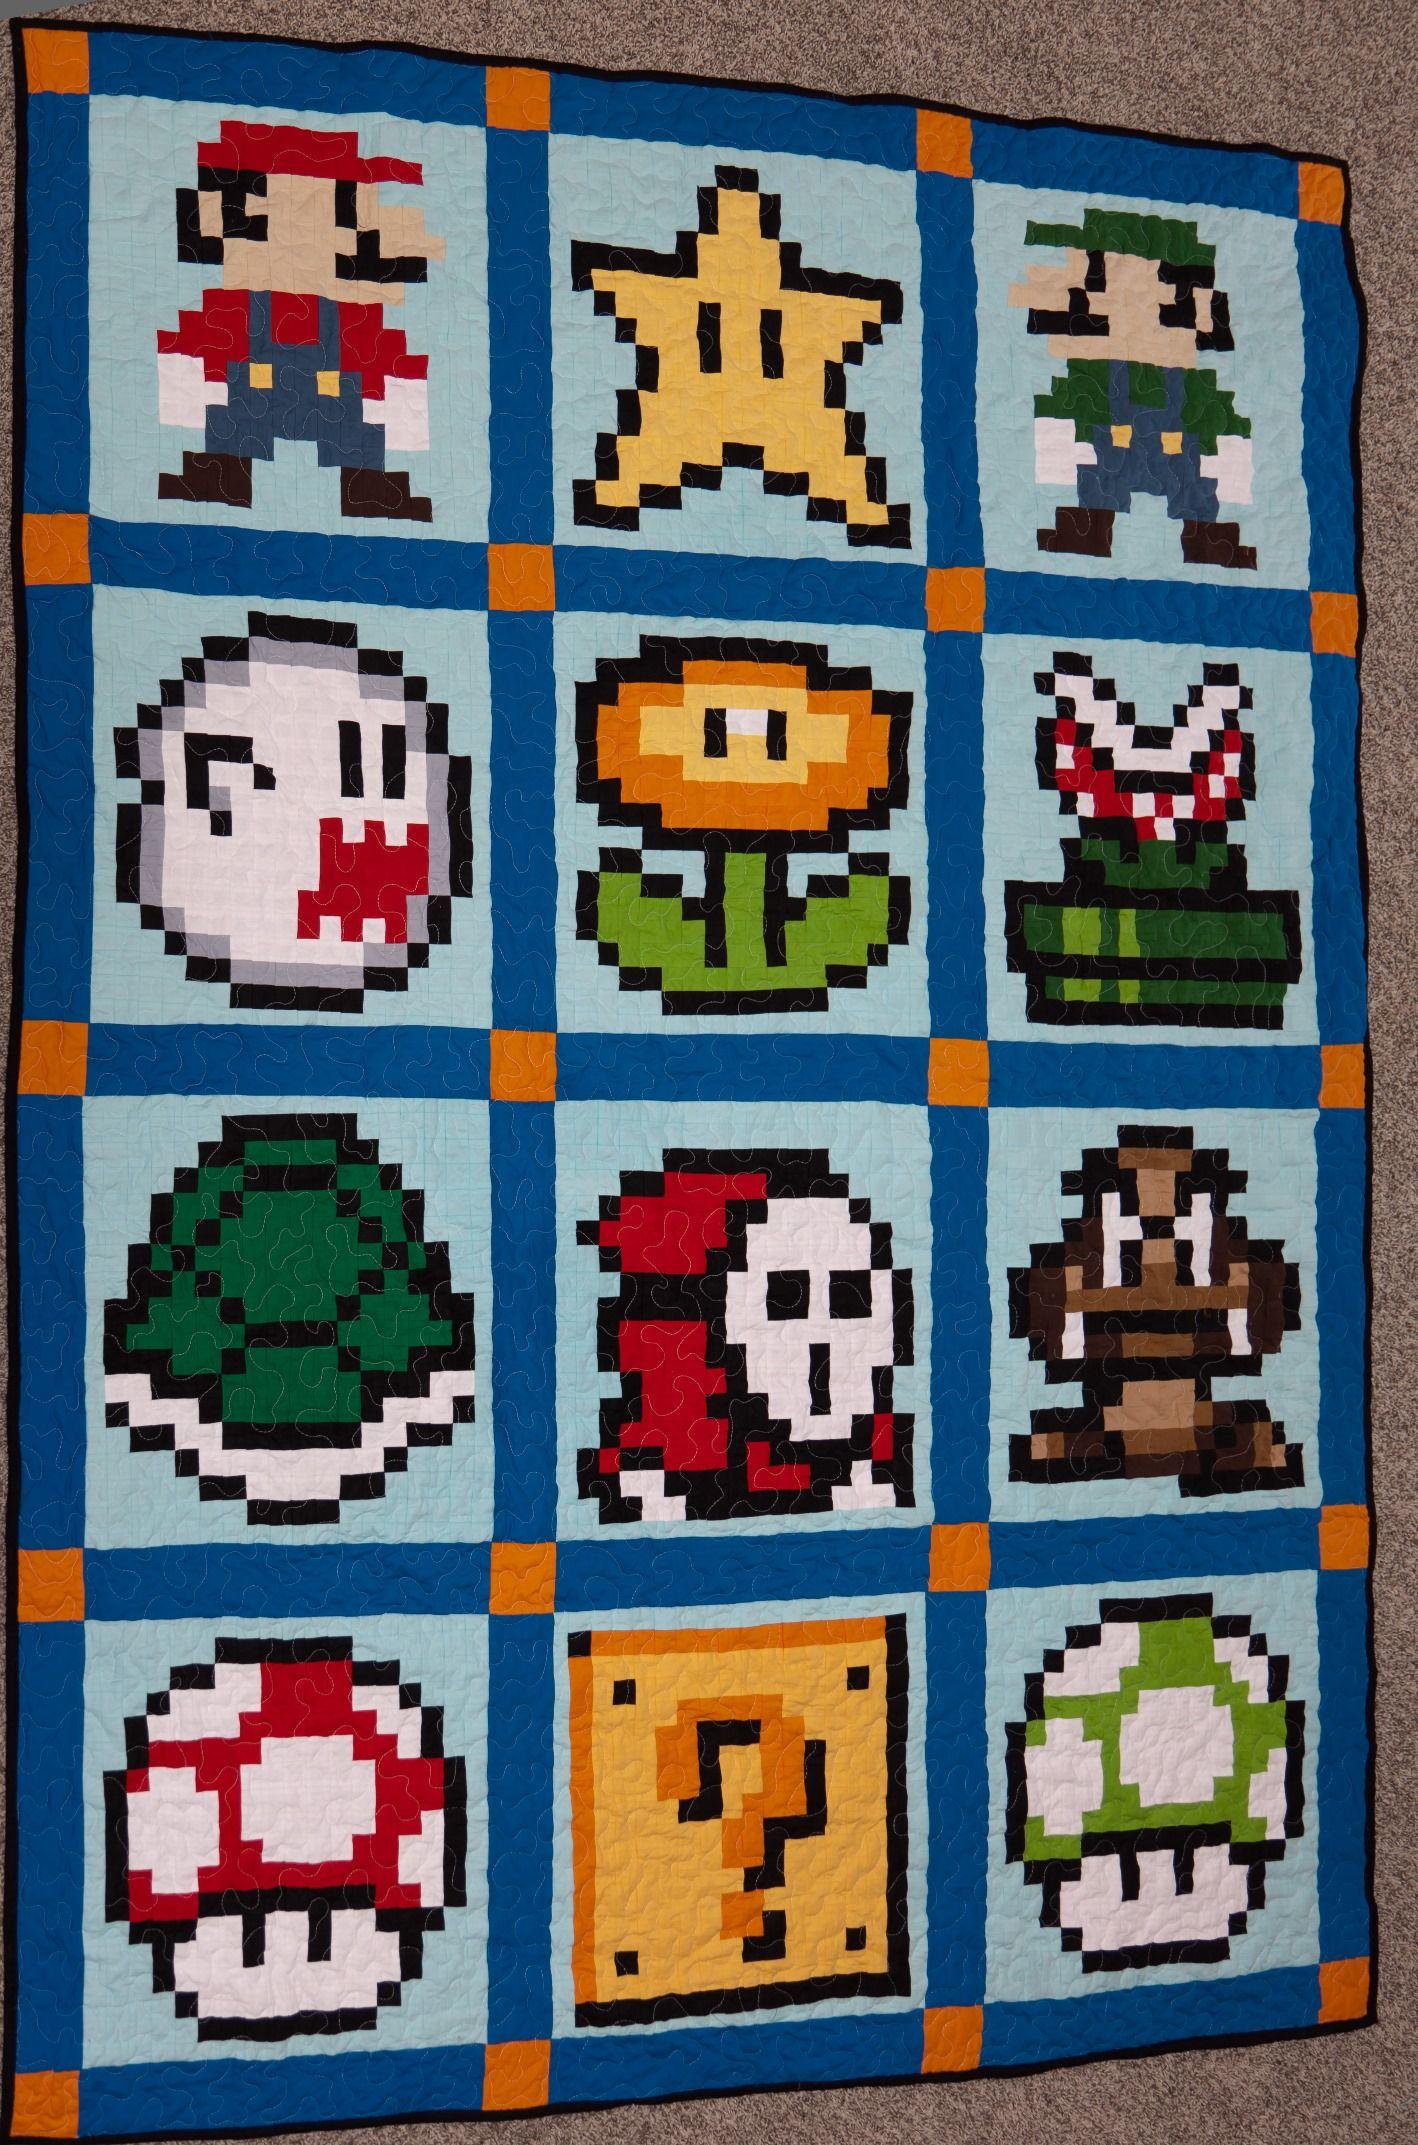 Finished My Mario Quilt Mario Quilt Mario Quilt Pattern Pixel Quilting